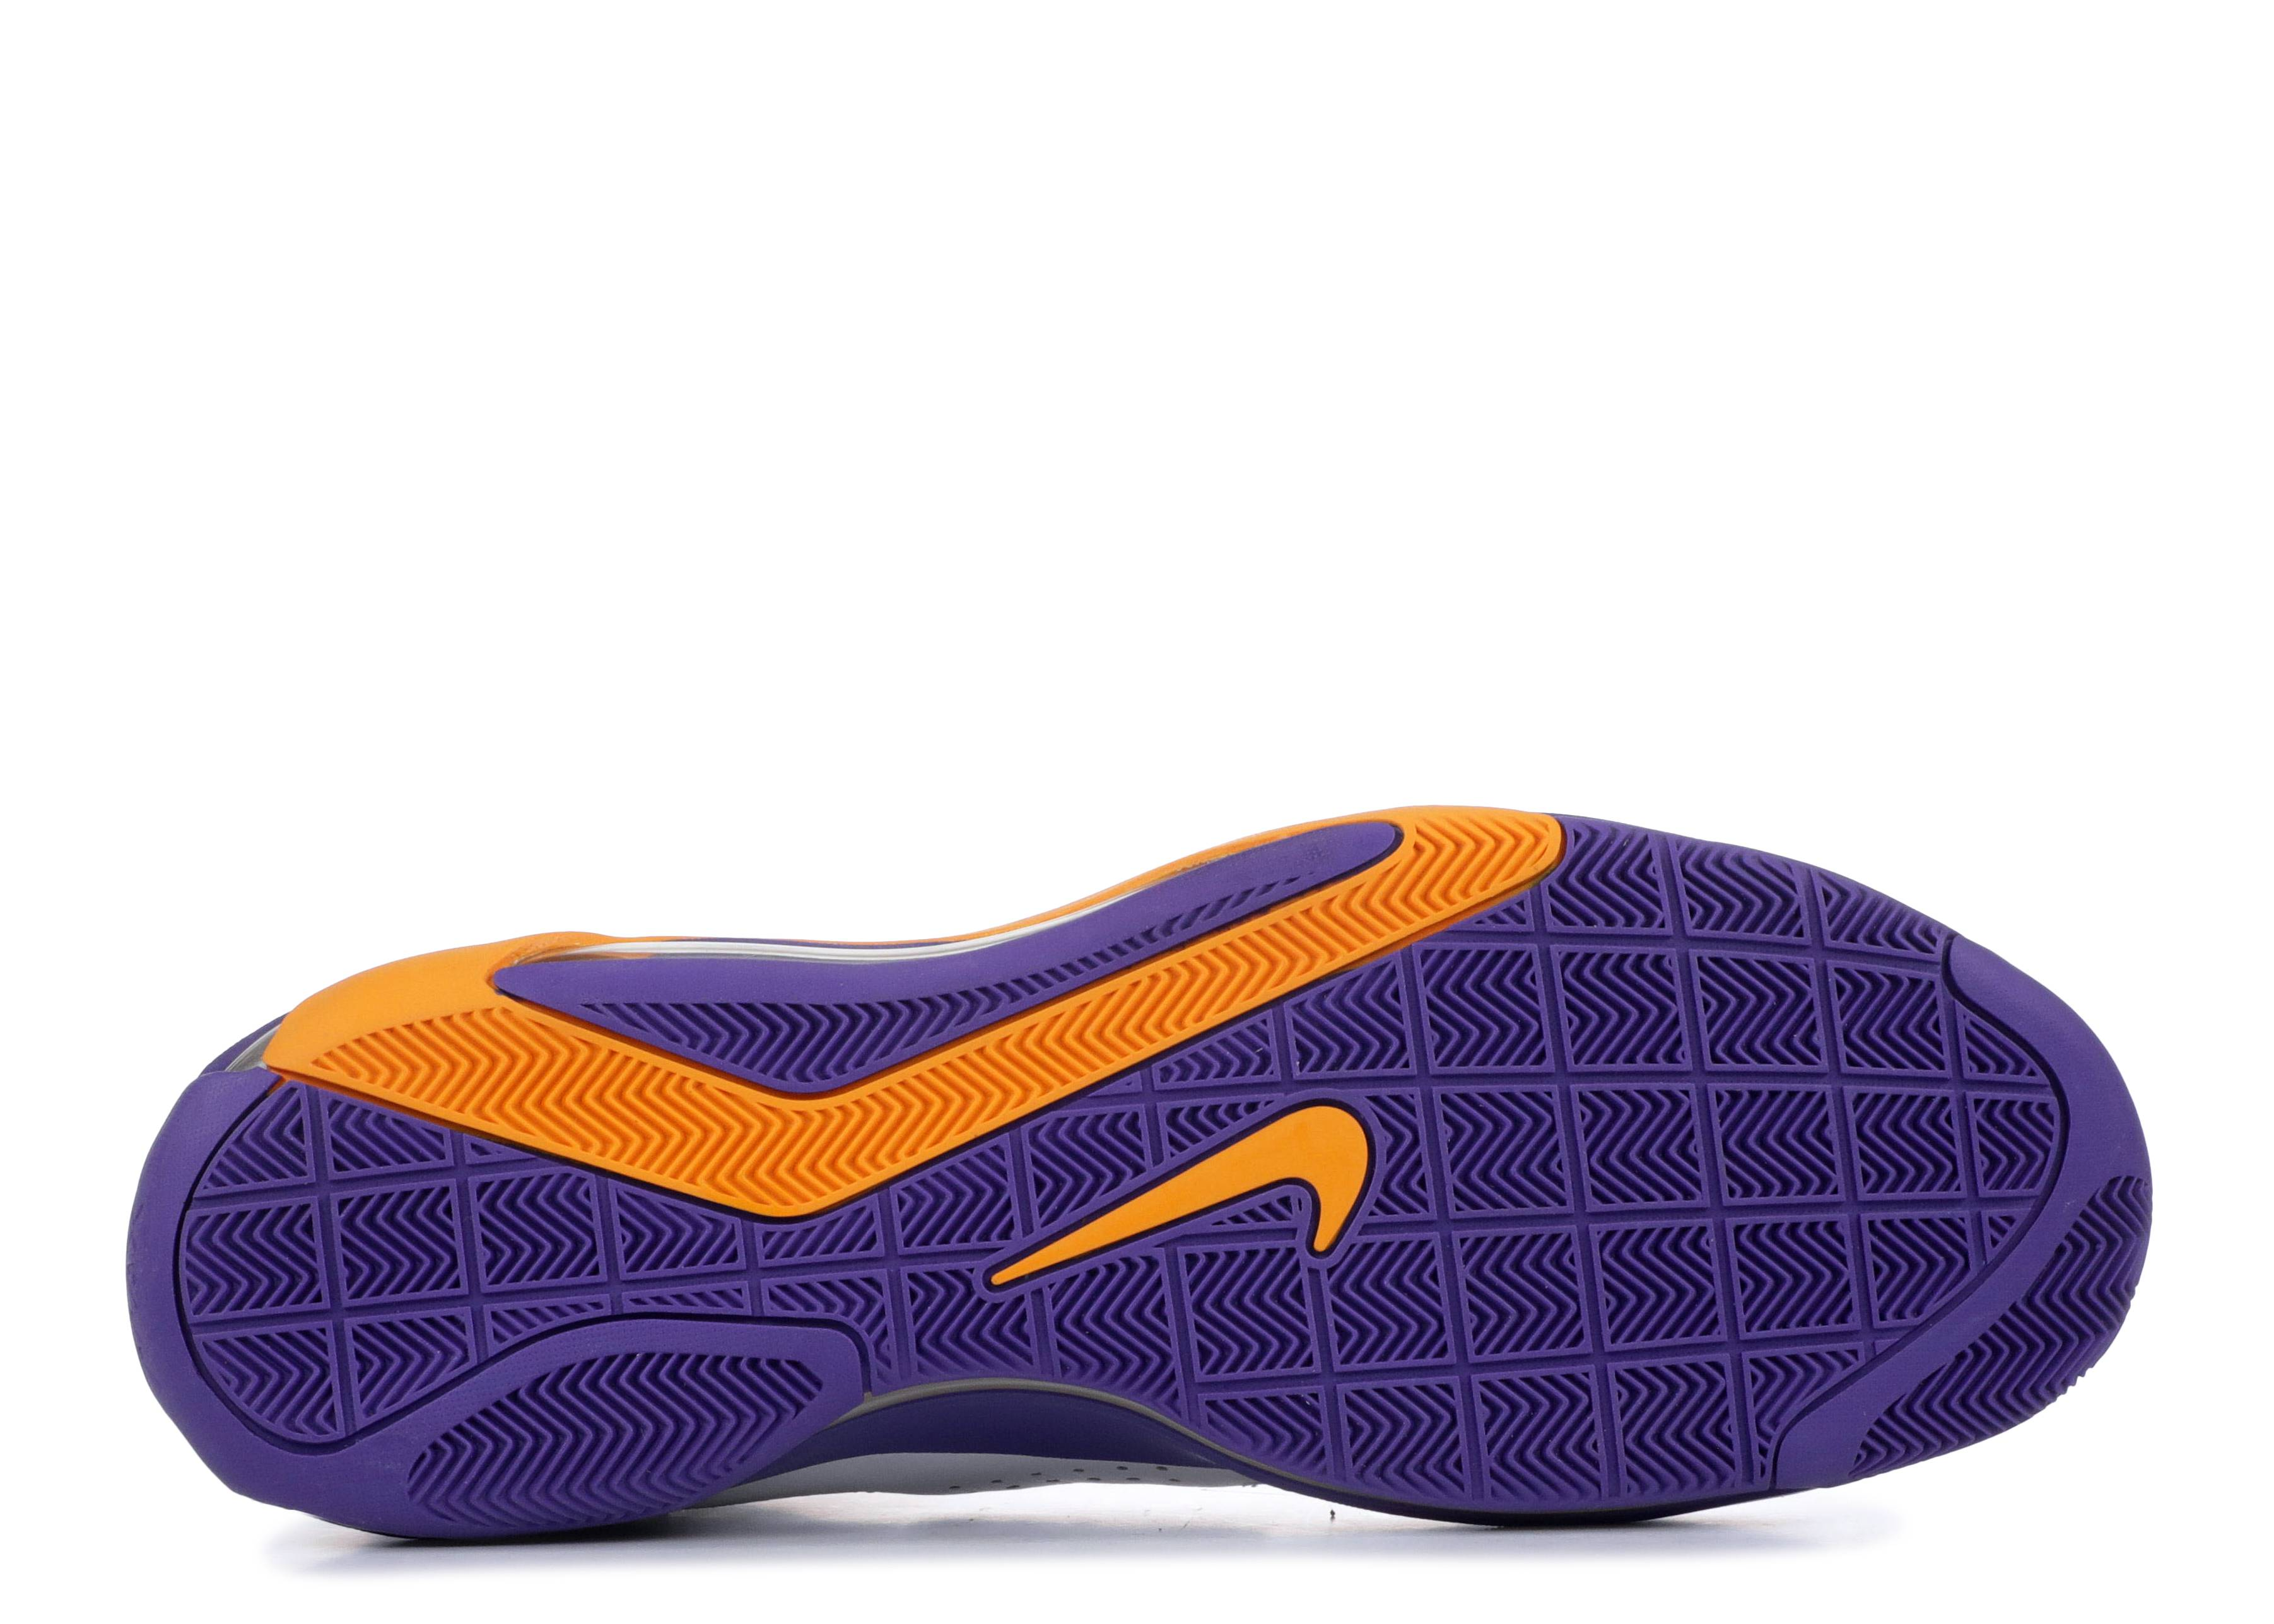 b3550bc43092a7 Nike Hypermax